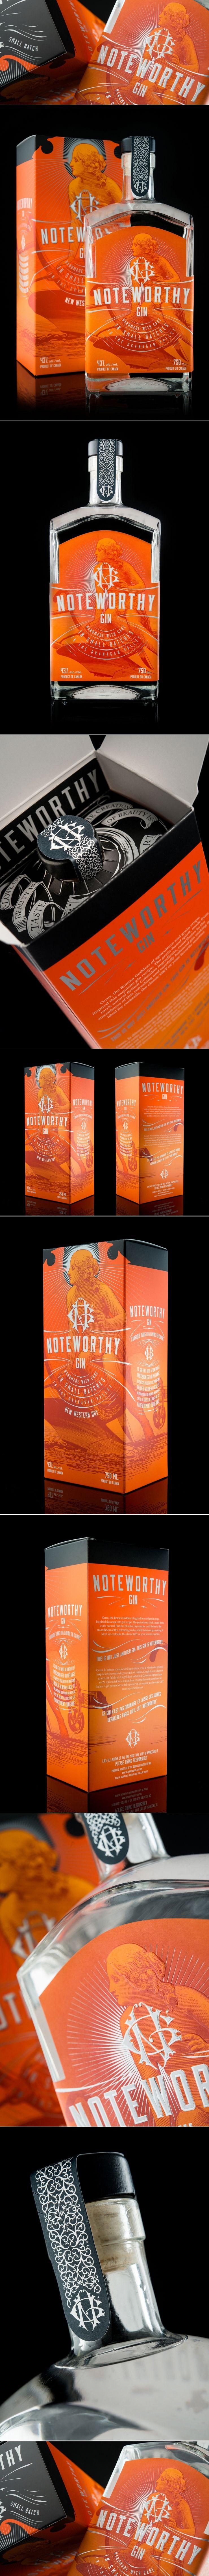 Noteworthy Gin — The Dieline | Packaging & Branding Design & Innovation News